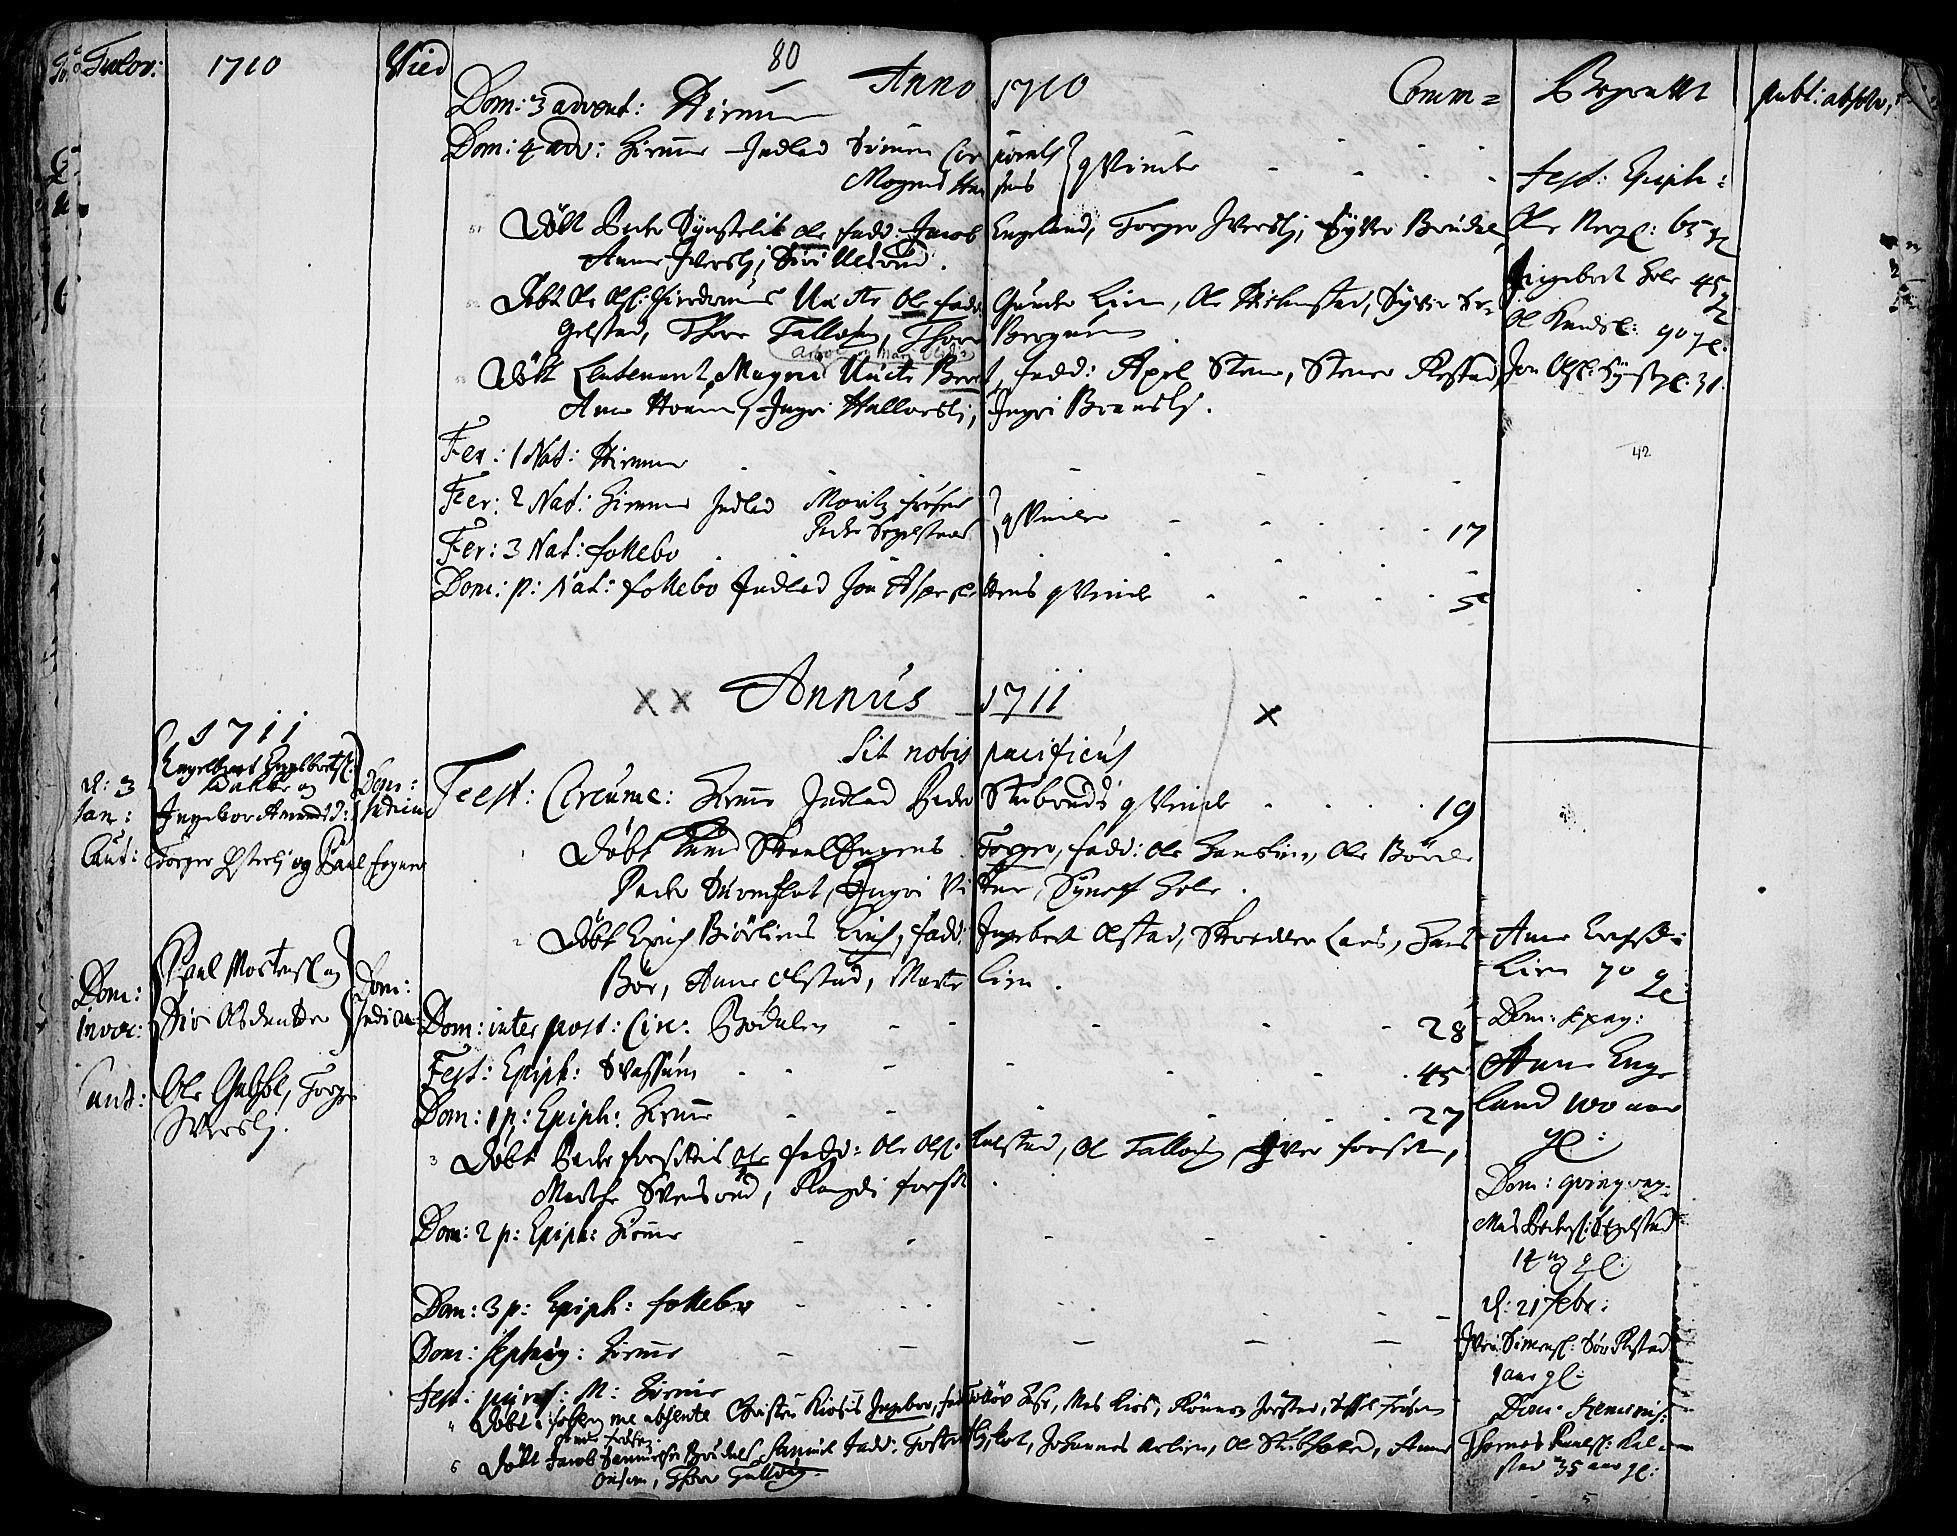 SAH, Gausdal prestekontor, Ministerialbok nr. 1, 1693-1728, s. 80